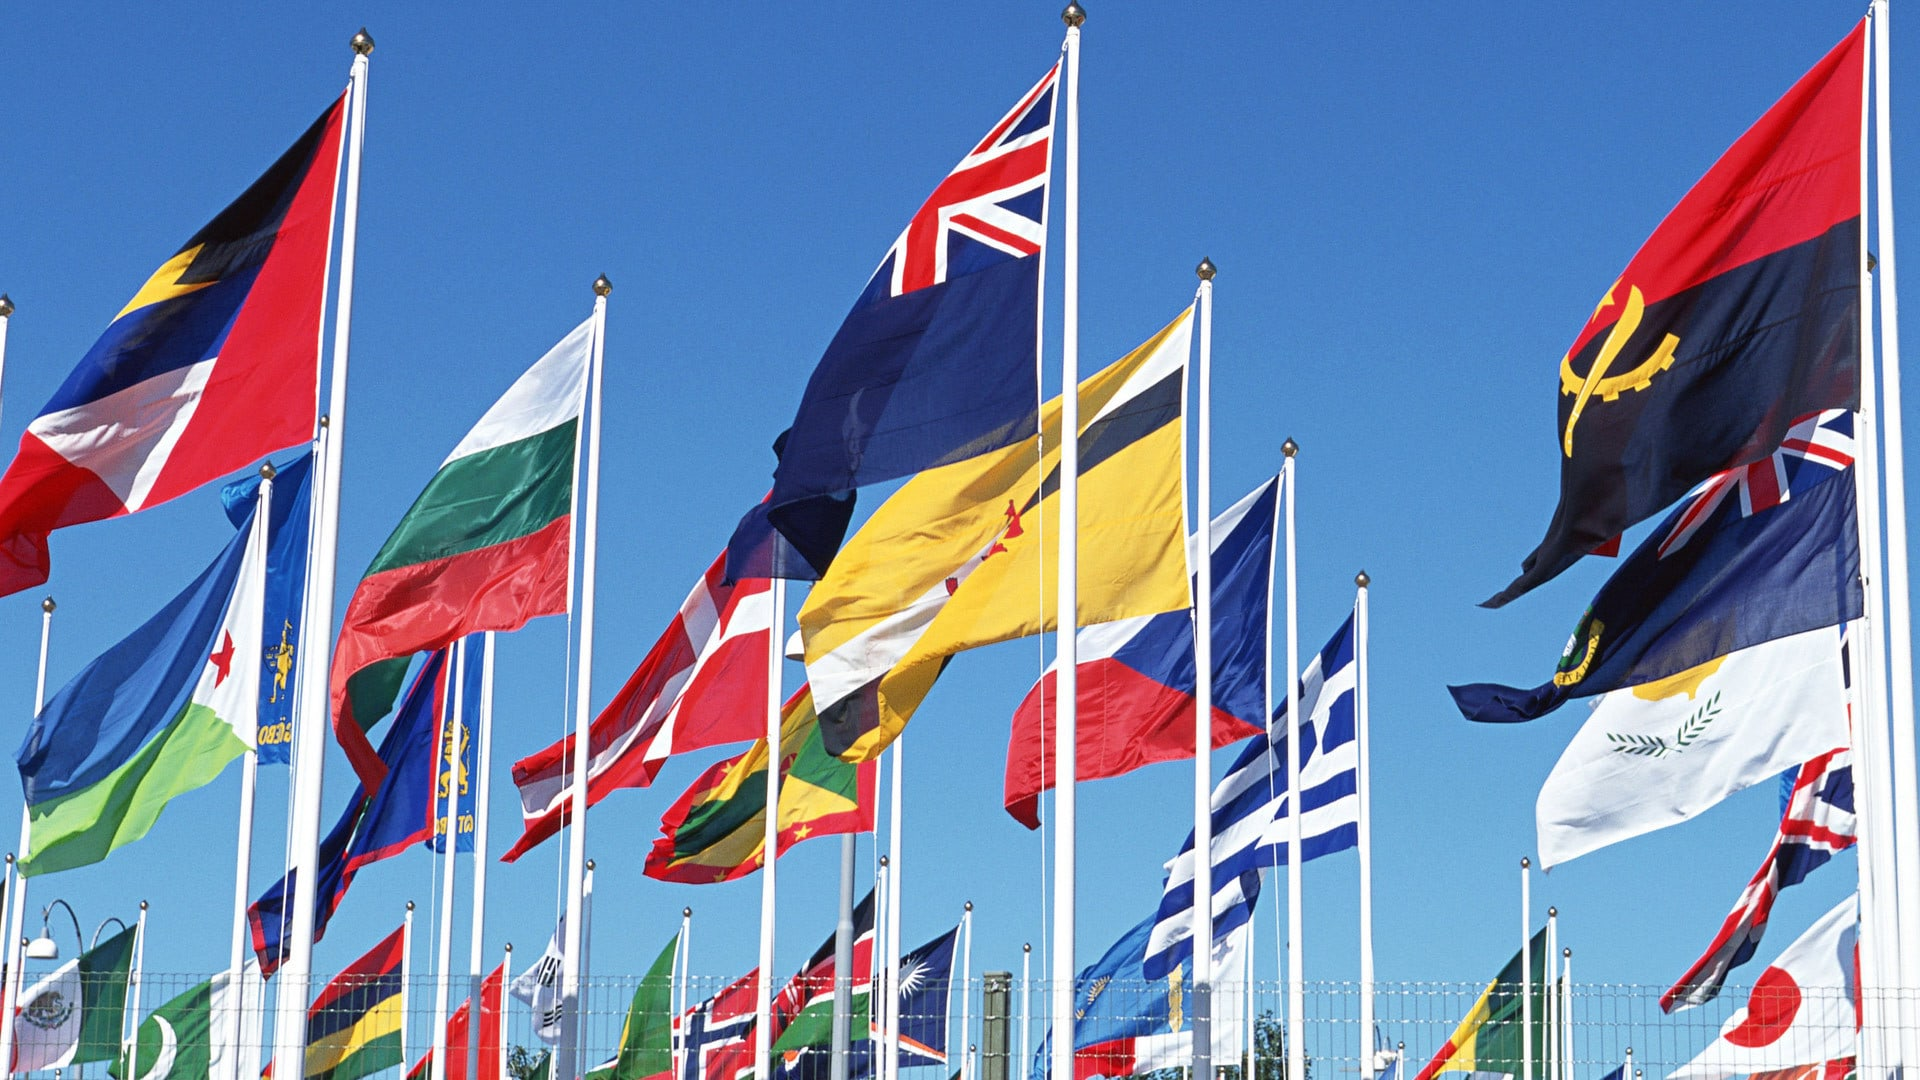 воин доступна картинки флагов всех стран в мире шаляпин крайне